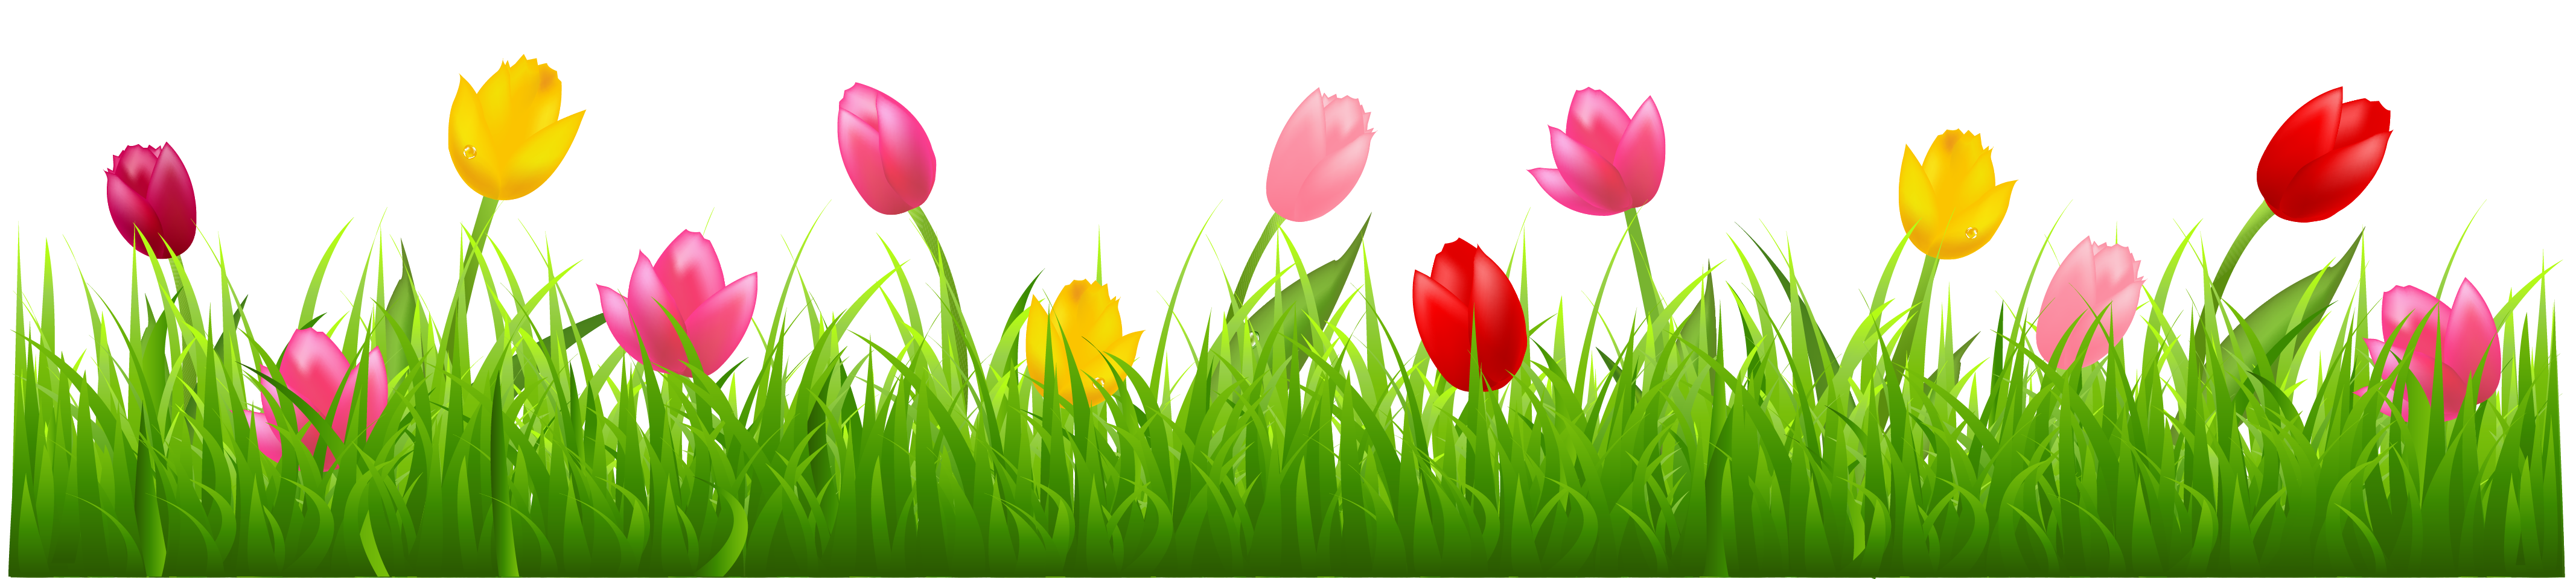 Row of grass clipart jpg free stock Free Premium Cliparts - ClipartFest jpg free stock